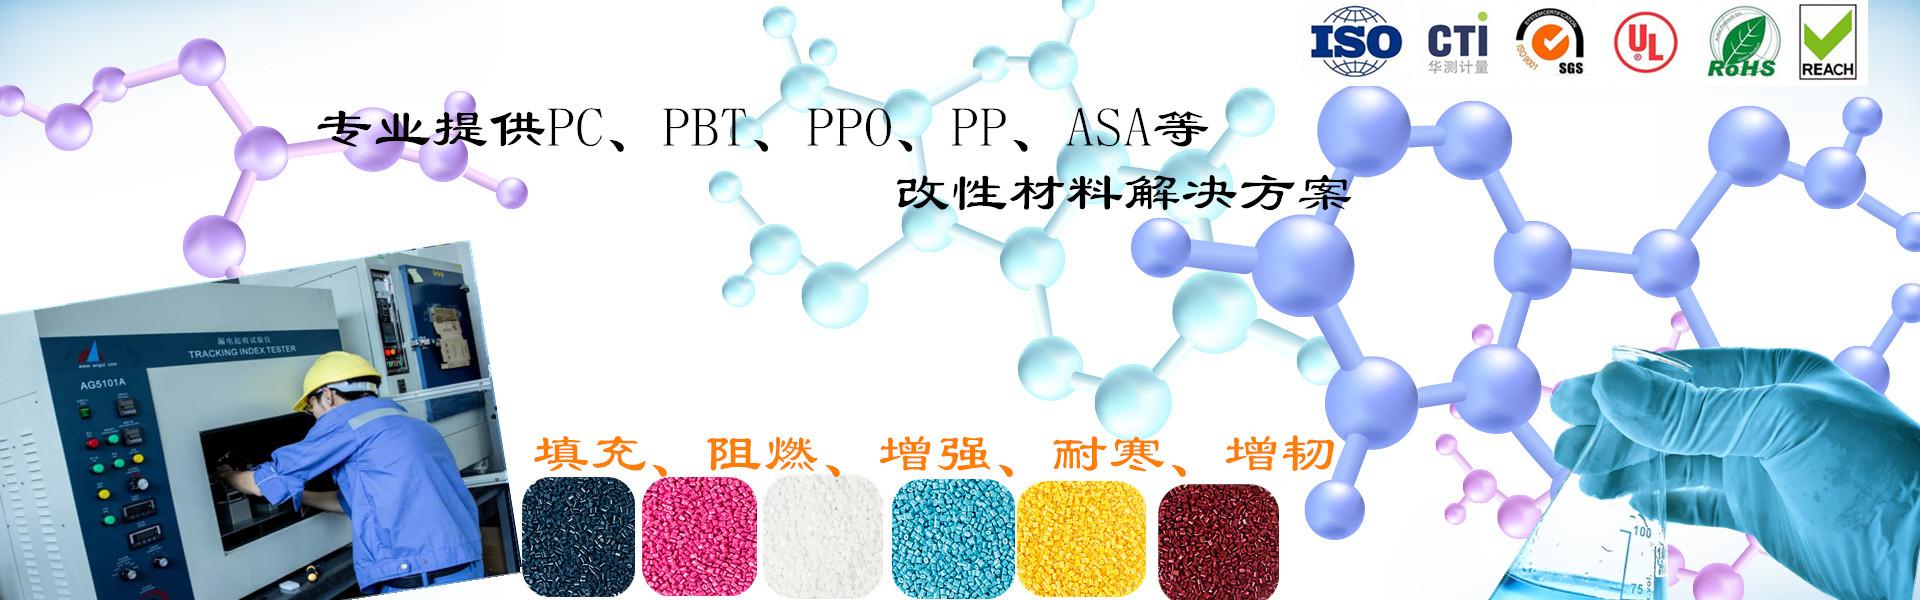 ASA工程塑料_PC改性塑料_改性塑料_工程塑料价格_厂家_供应商_厦门